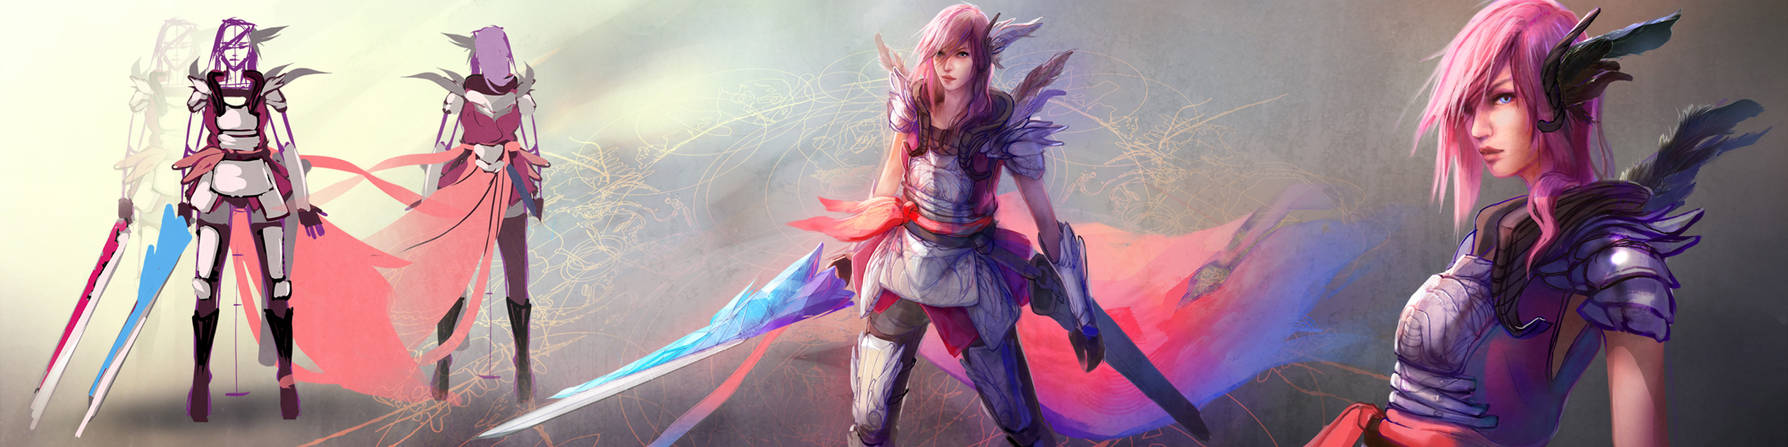 Lightning Returns - FFXIII - Silver Pink Garb